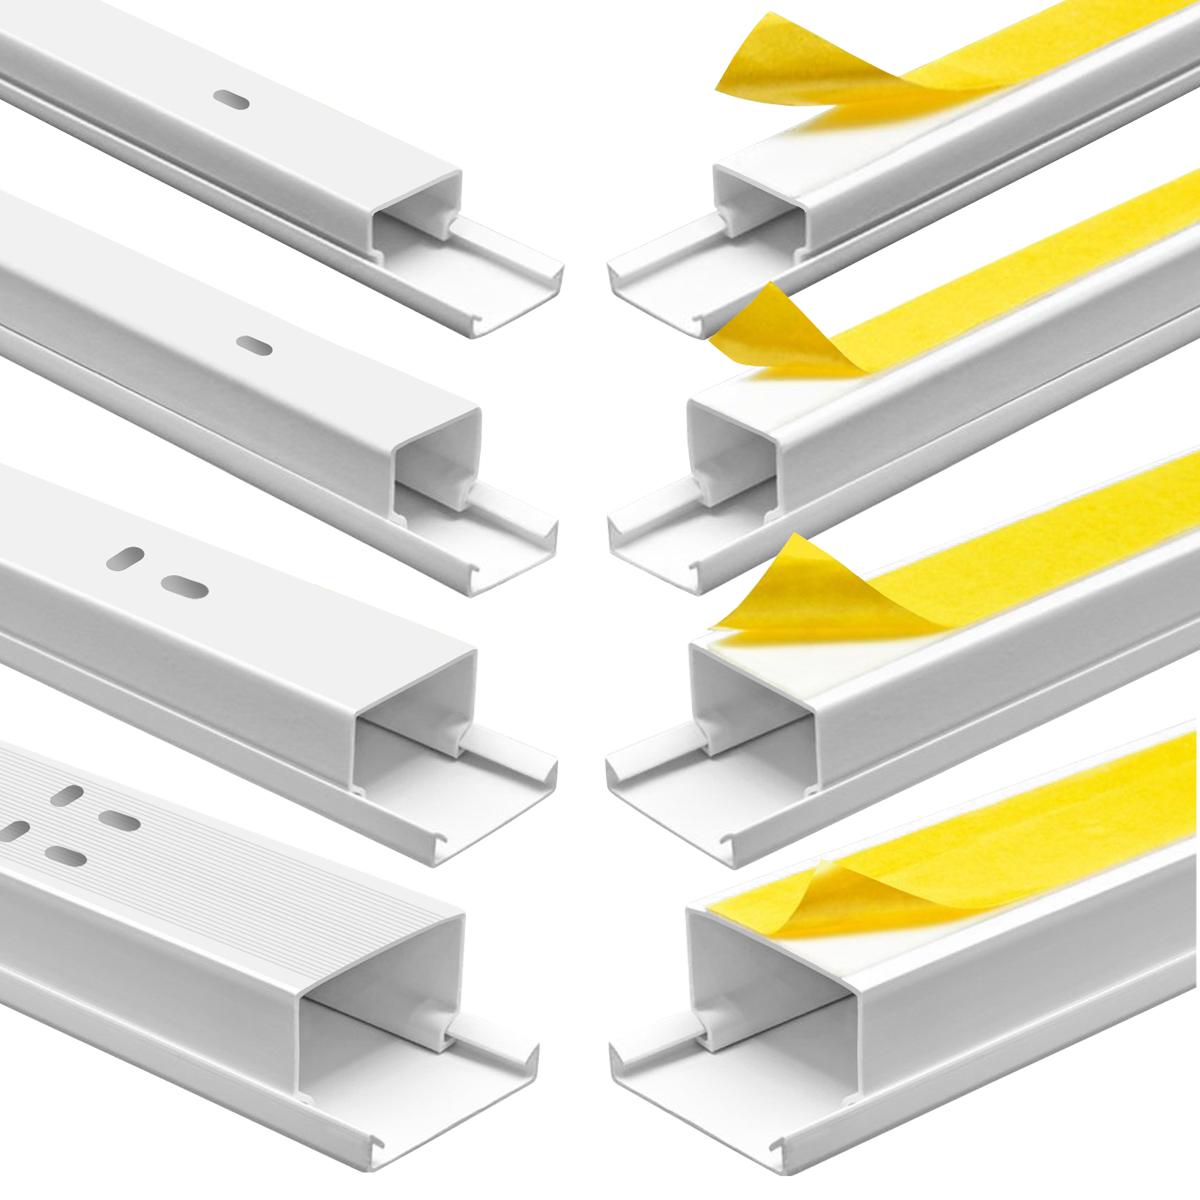 Kabelkanal 200 cm 40 x 40 mm Kabelröhre Installationskanal weiß Kabelschacht